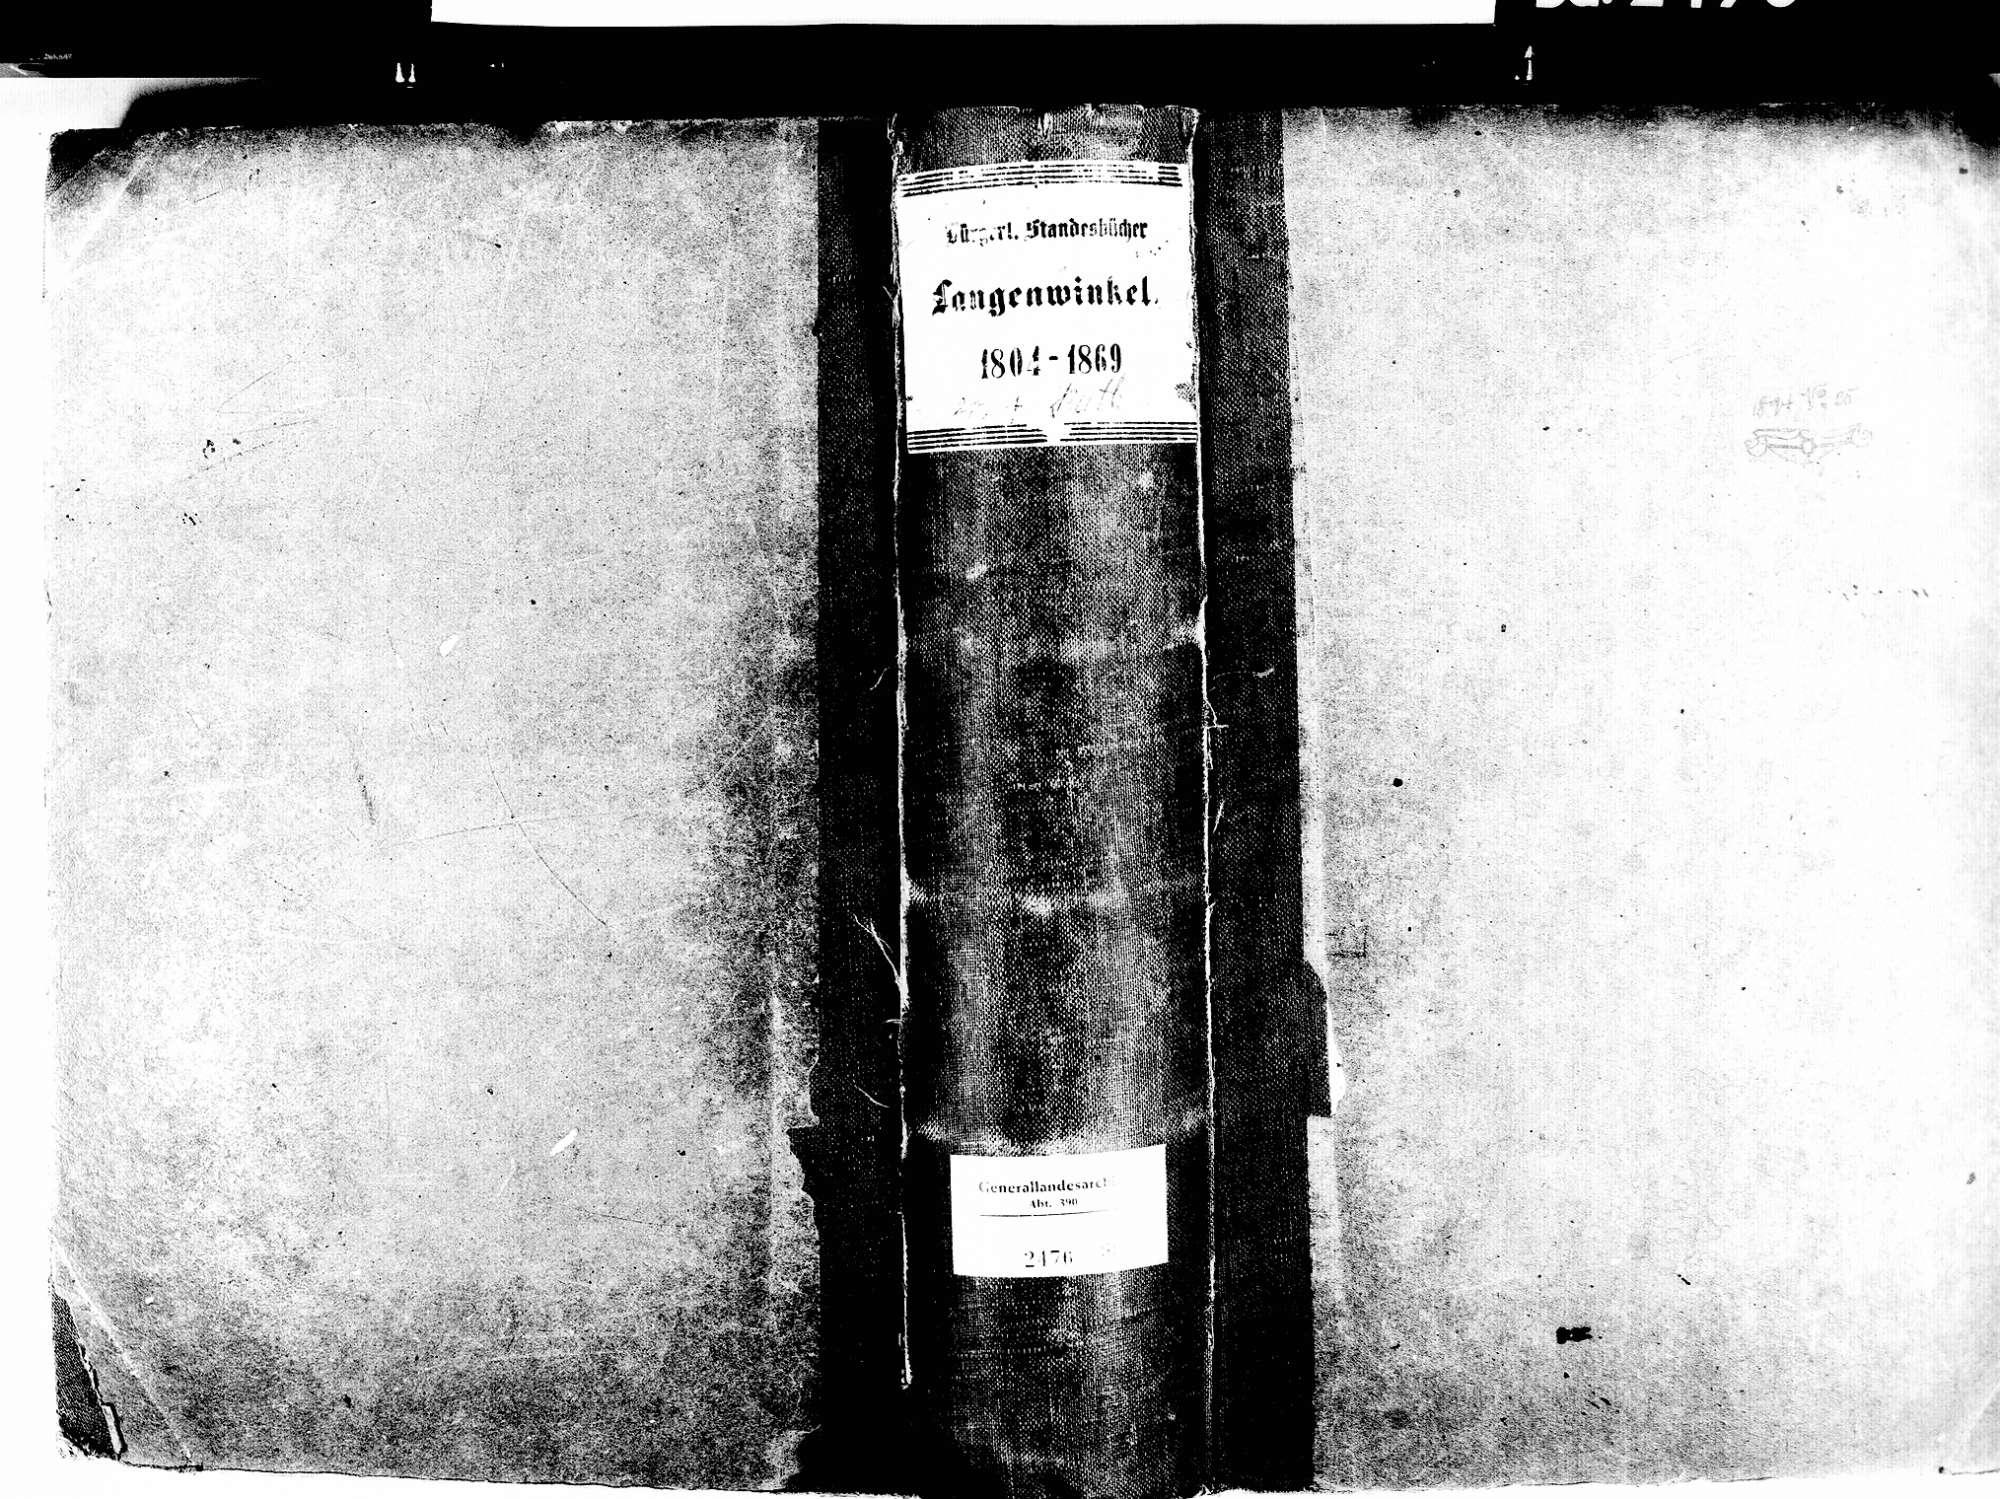 Langenwinkel, Lahr im Schwarzwald OG; Evangelische Gemeinde: Standesbuch 1804-1869 Langenwinkel, Lahr im Schwarzwald OG; Katholische Gemeinde: Standesbuch 1804-1869, Bild 1